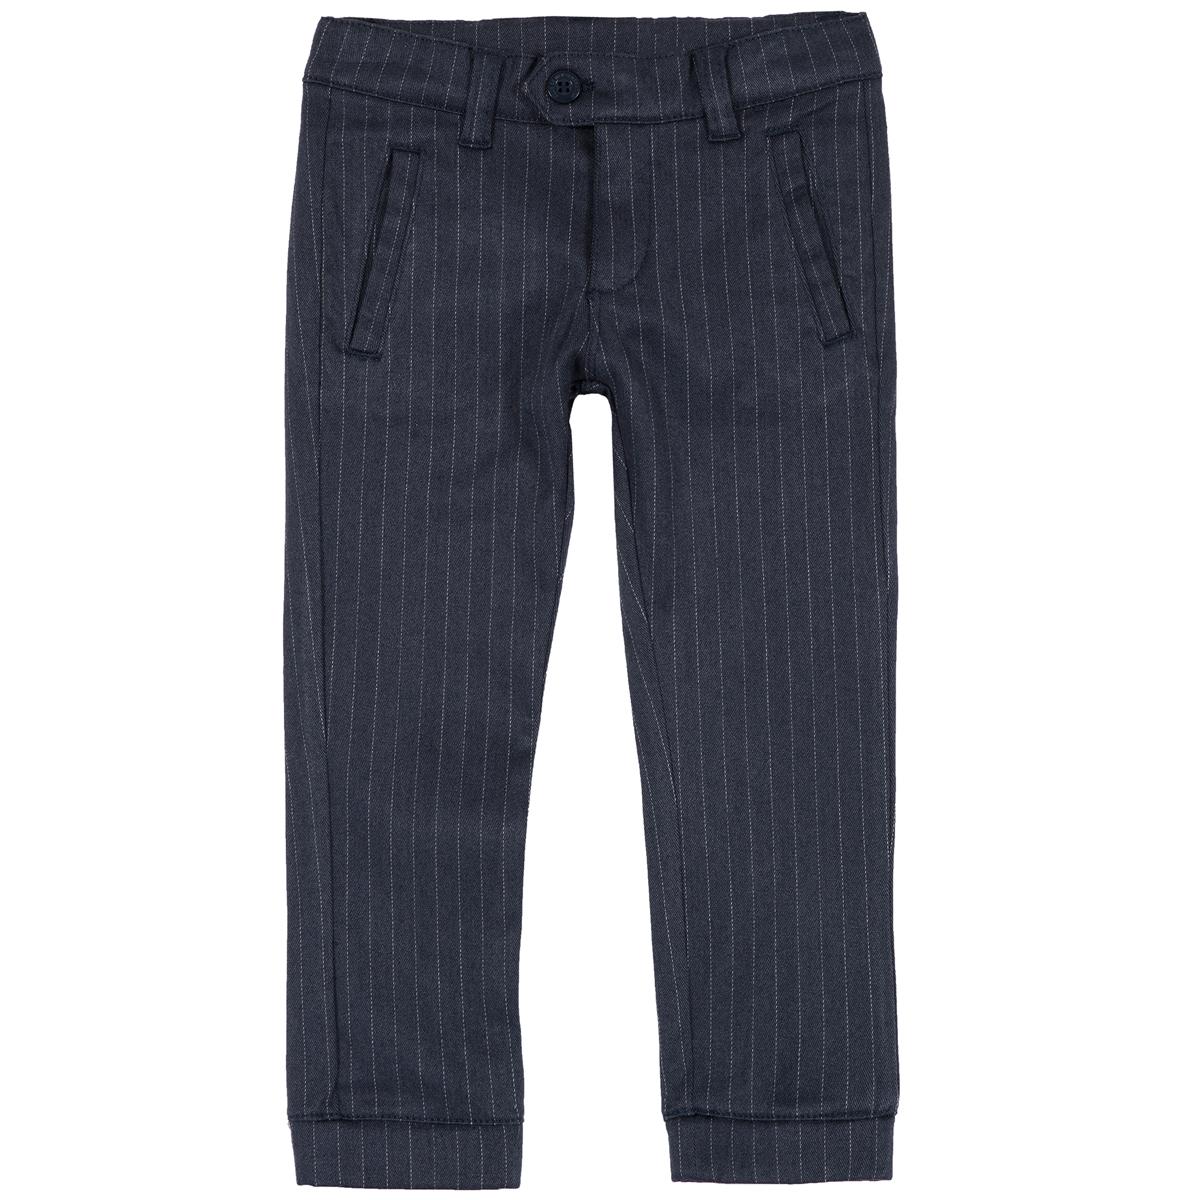 Pantaloni lungi copii Chicco, bleumarin cu dungi albe, 08046